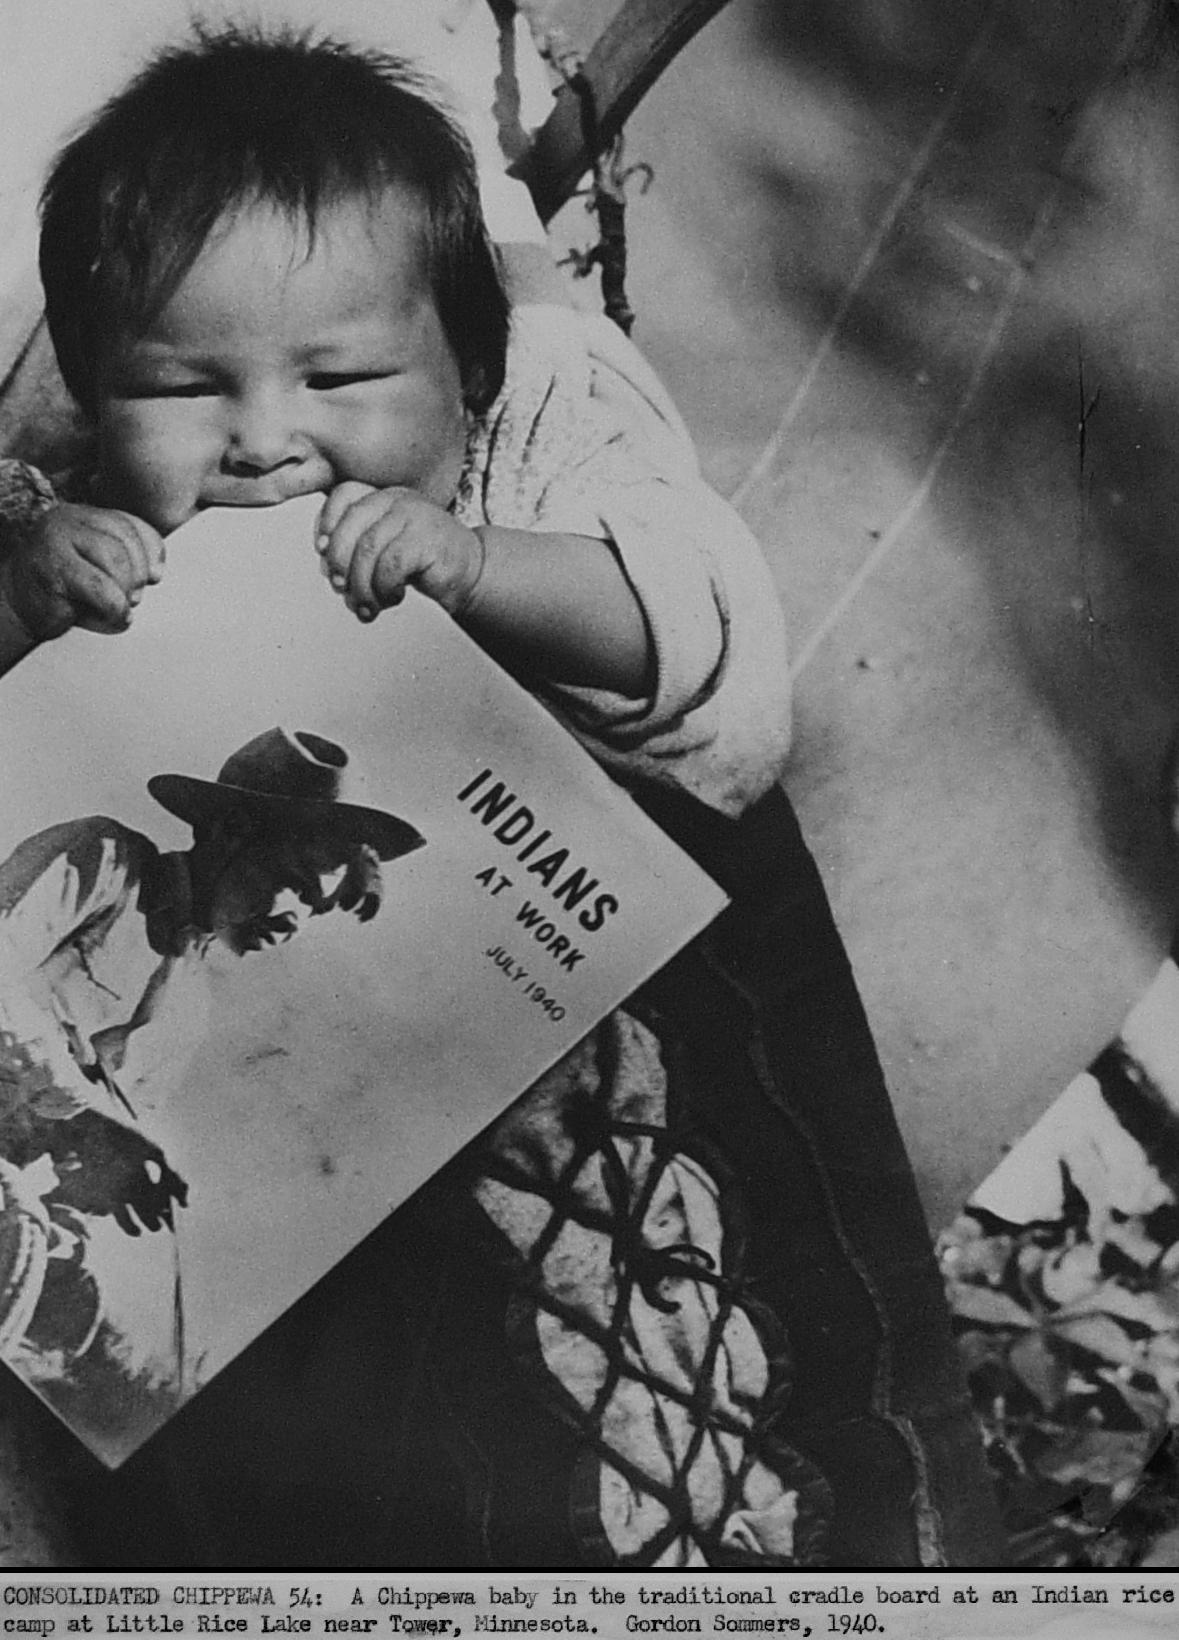 113 1940_govt_photo_minnesota_farming_scene_chippewa_baby_teething_on_magazine_indians_at_work.jpg